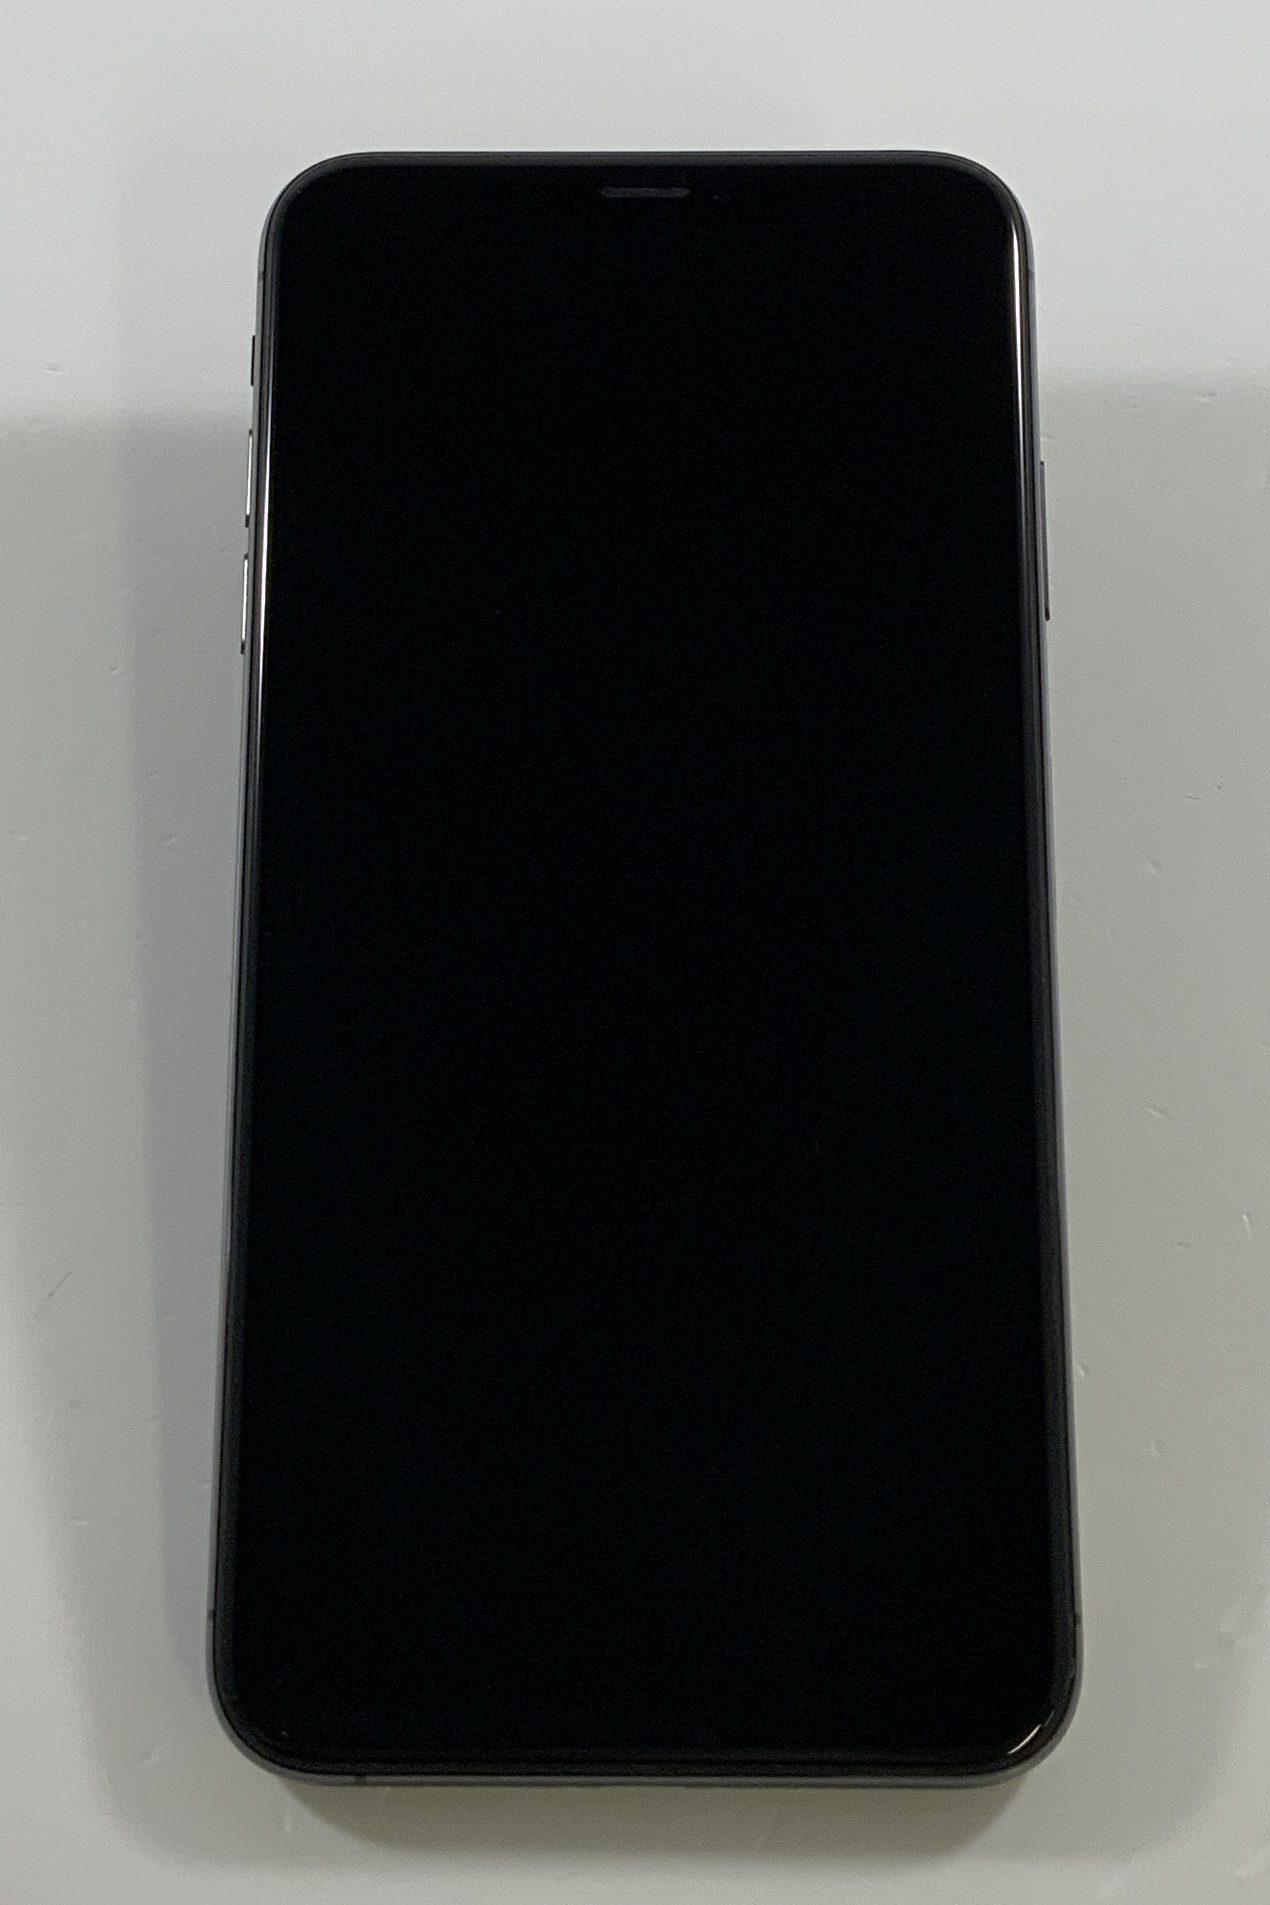 iPhone XS Max 256GB, 256GB, Space Gray, immagine 1